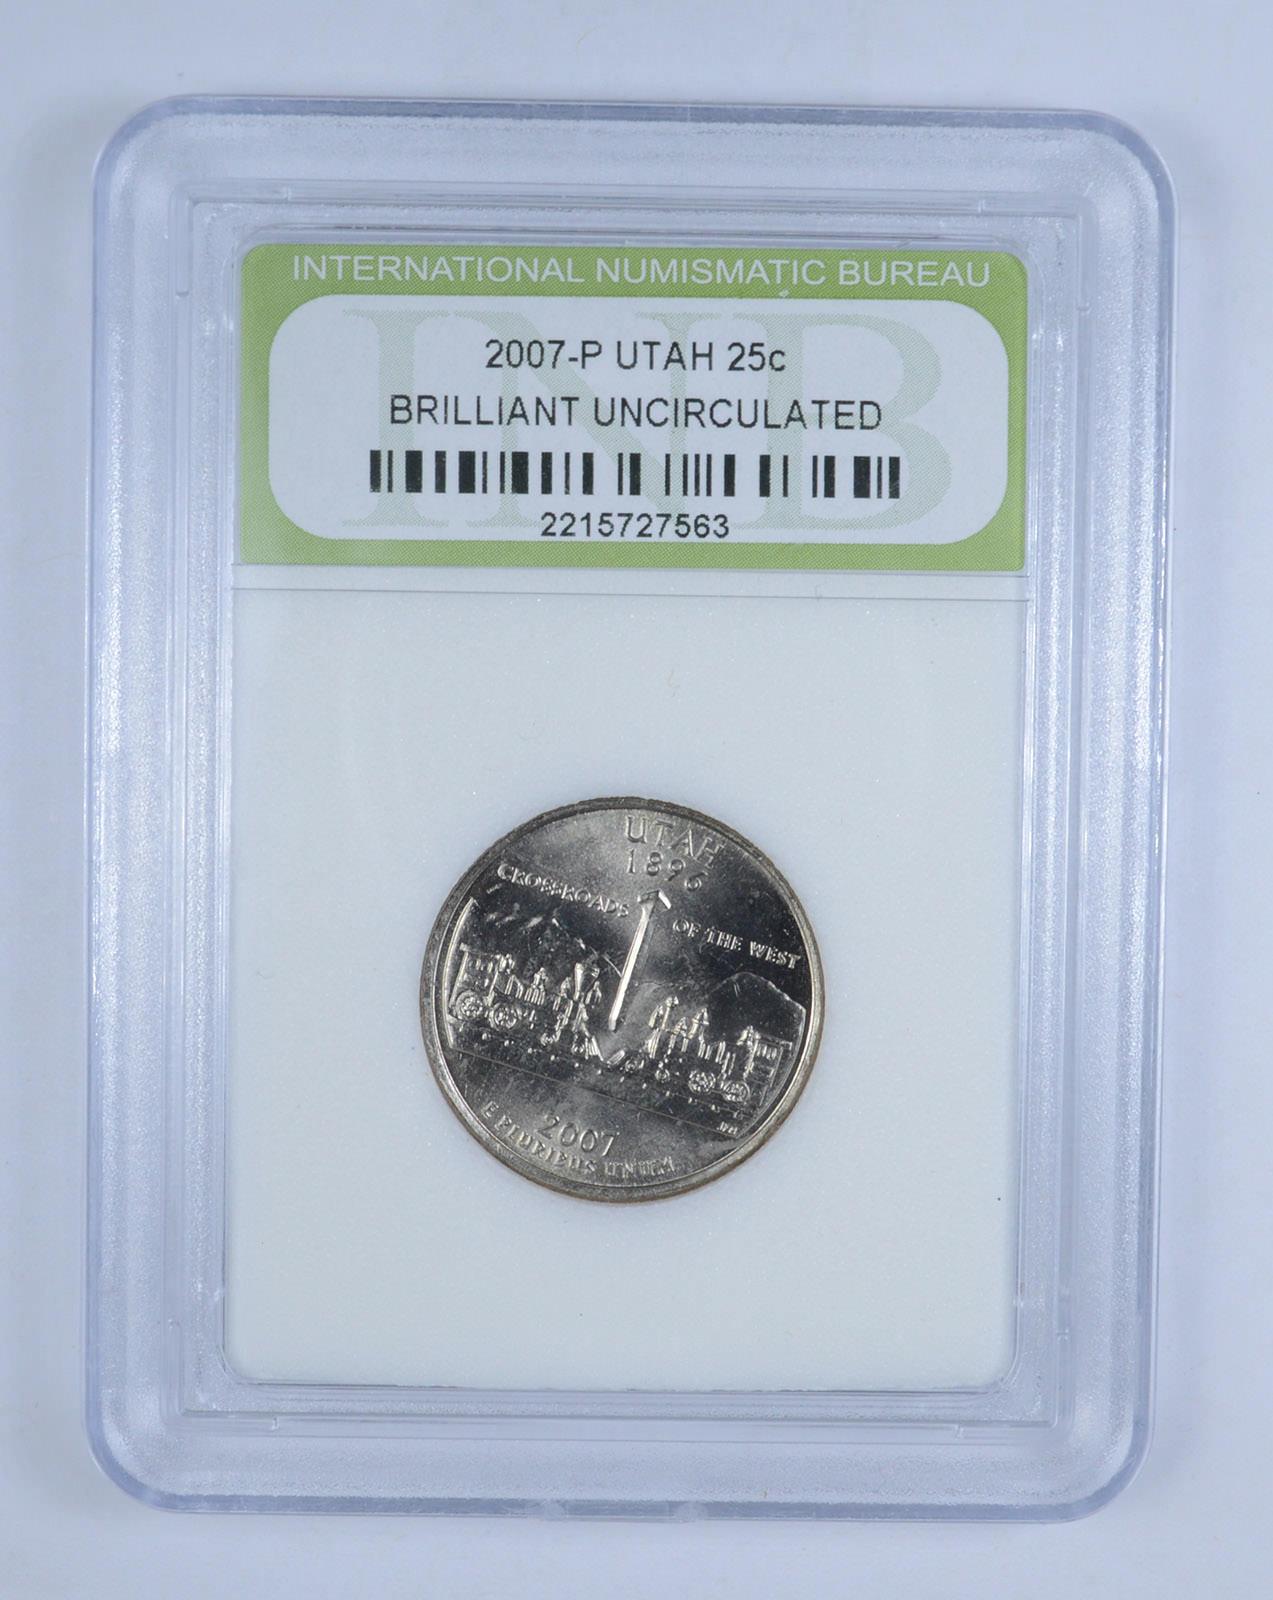 2007 P Utah State Quarter BU Brilliant Uncirculated Coin